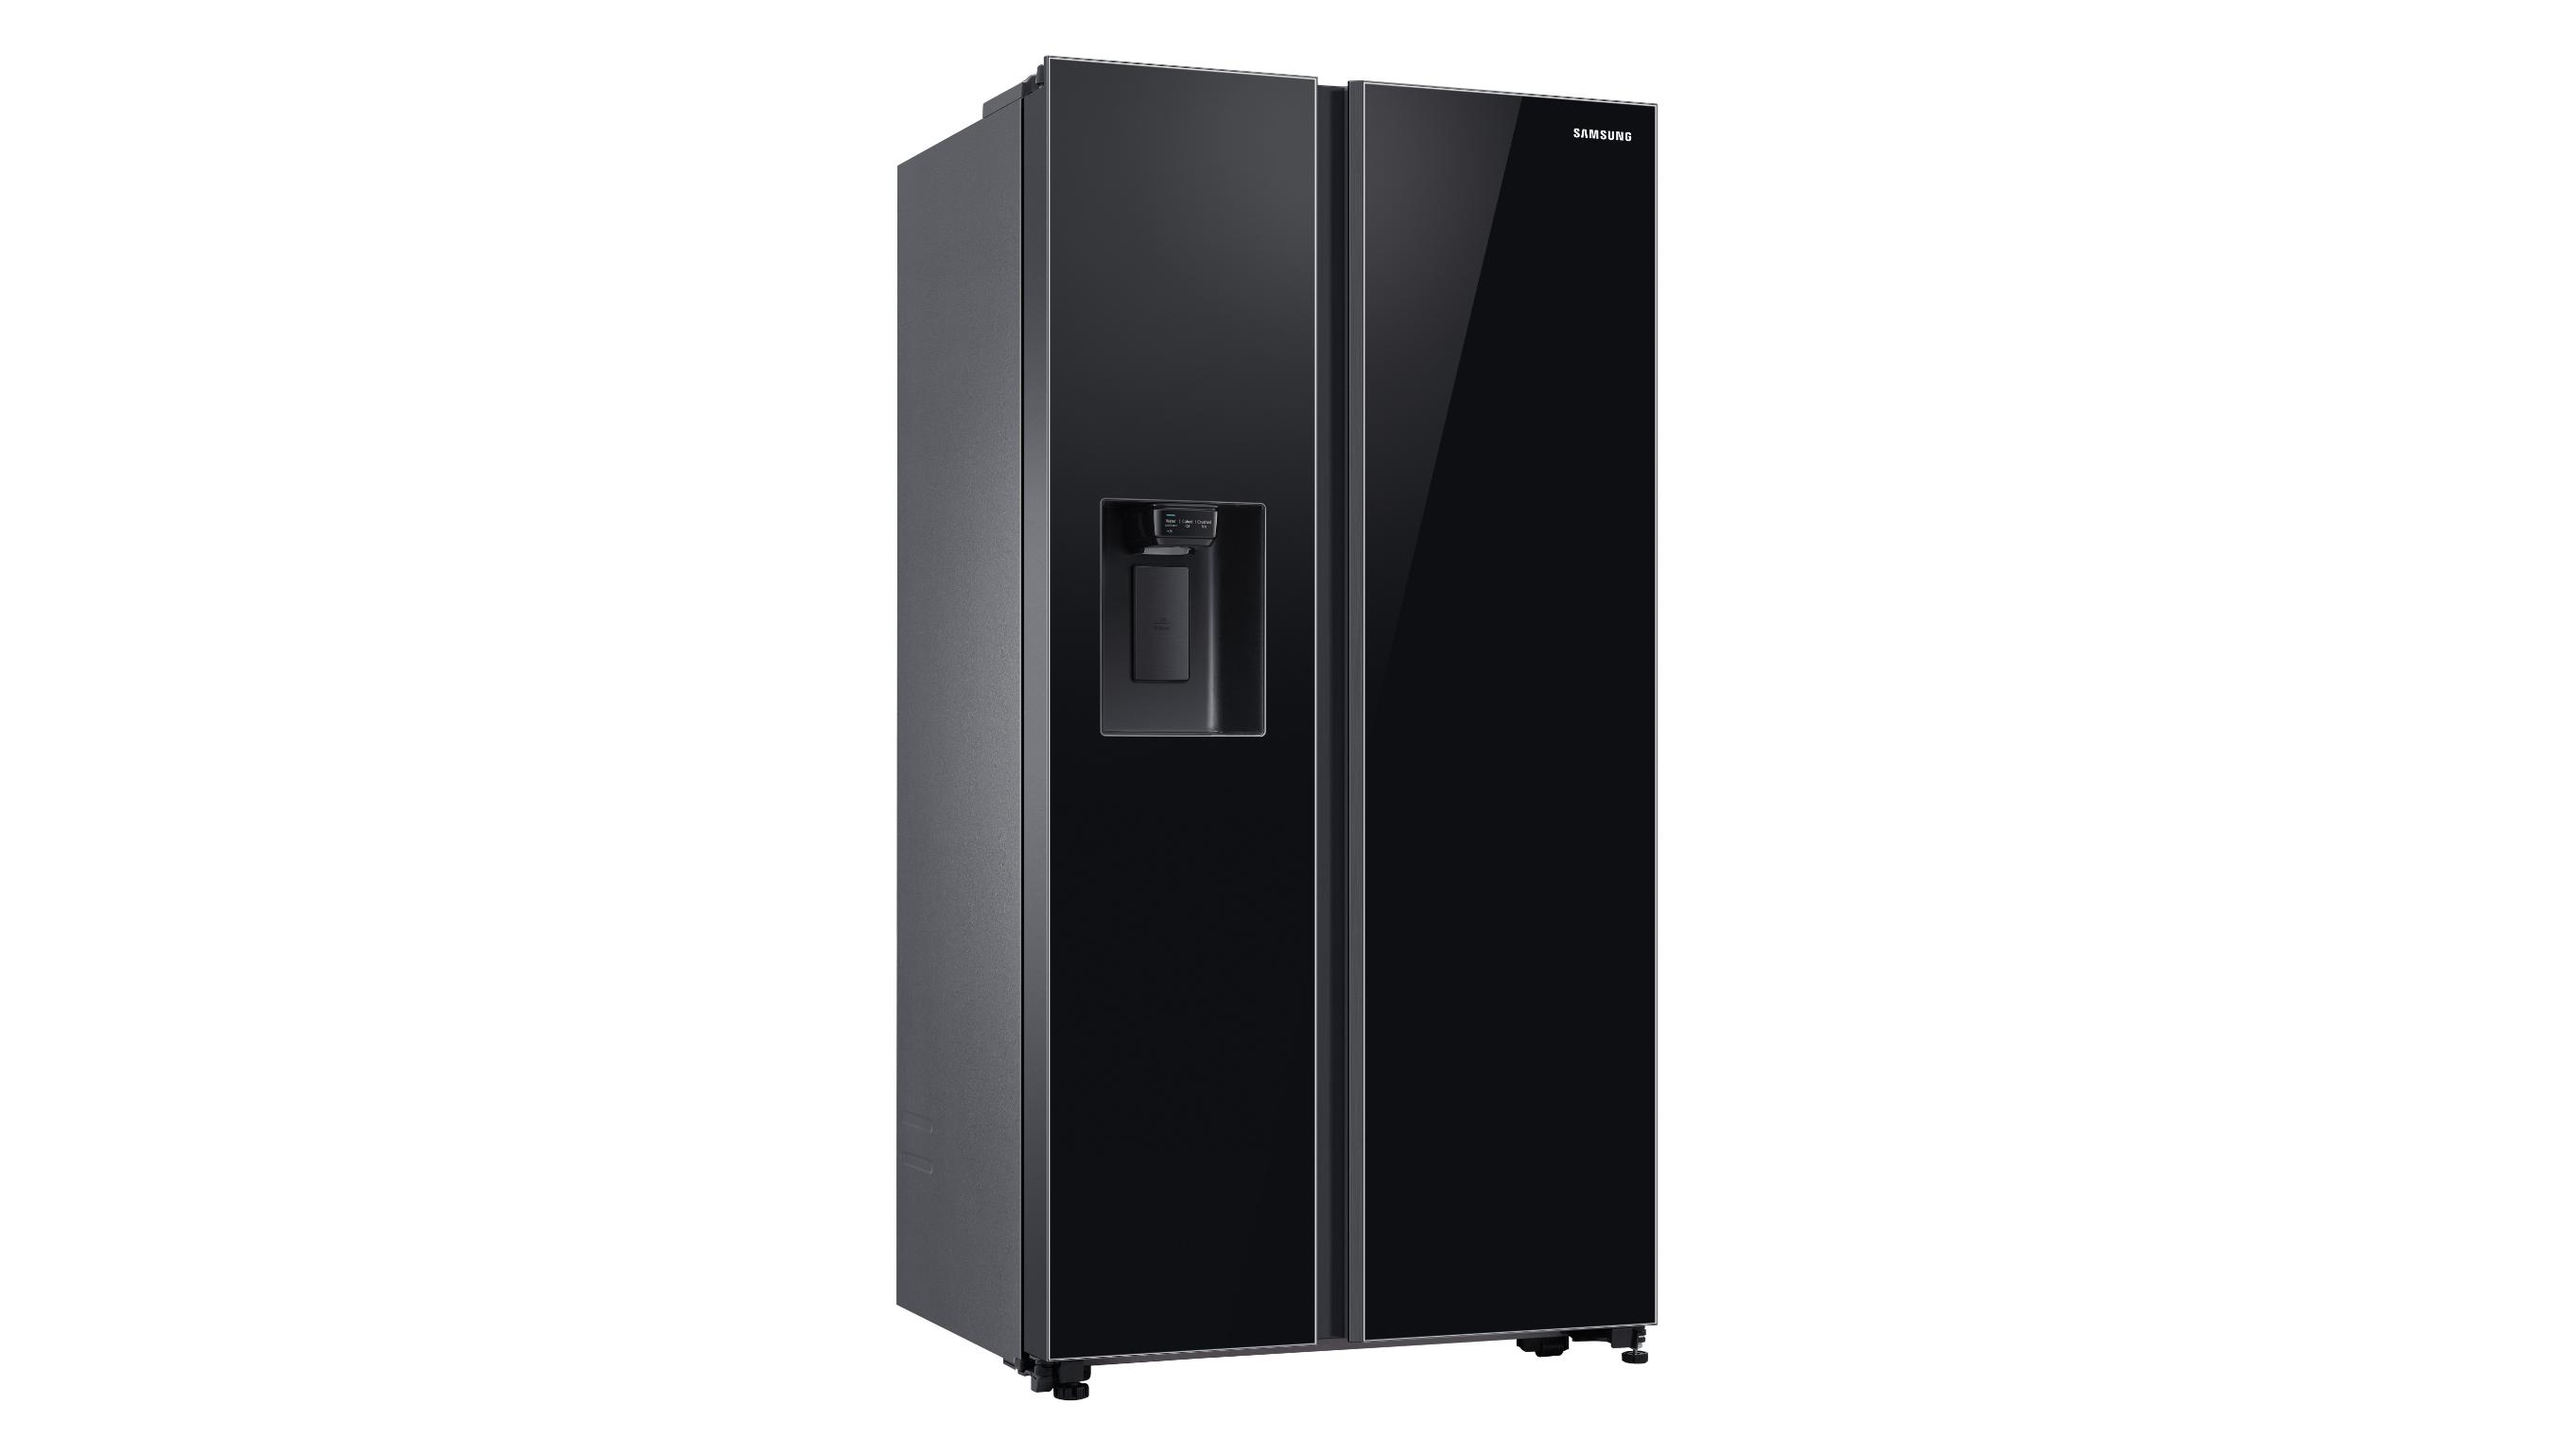 Samsung_Refrigerator